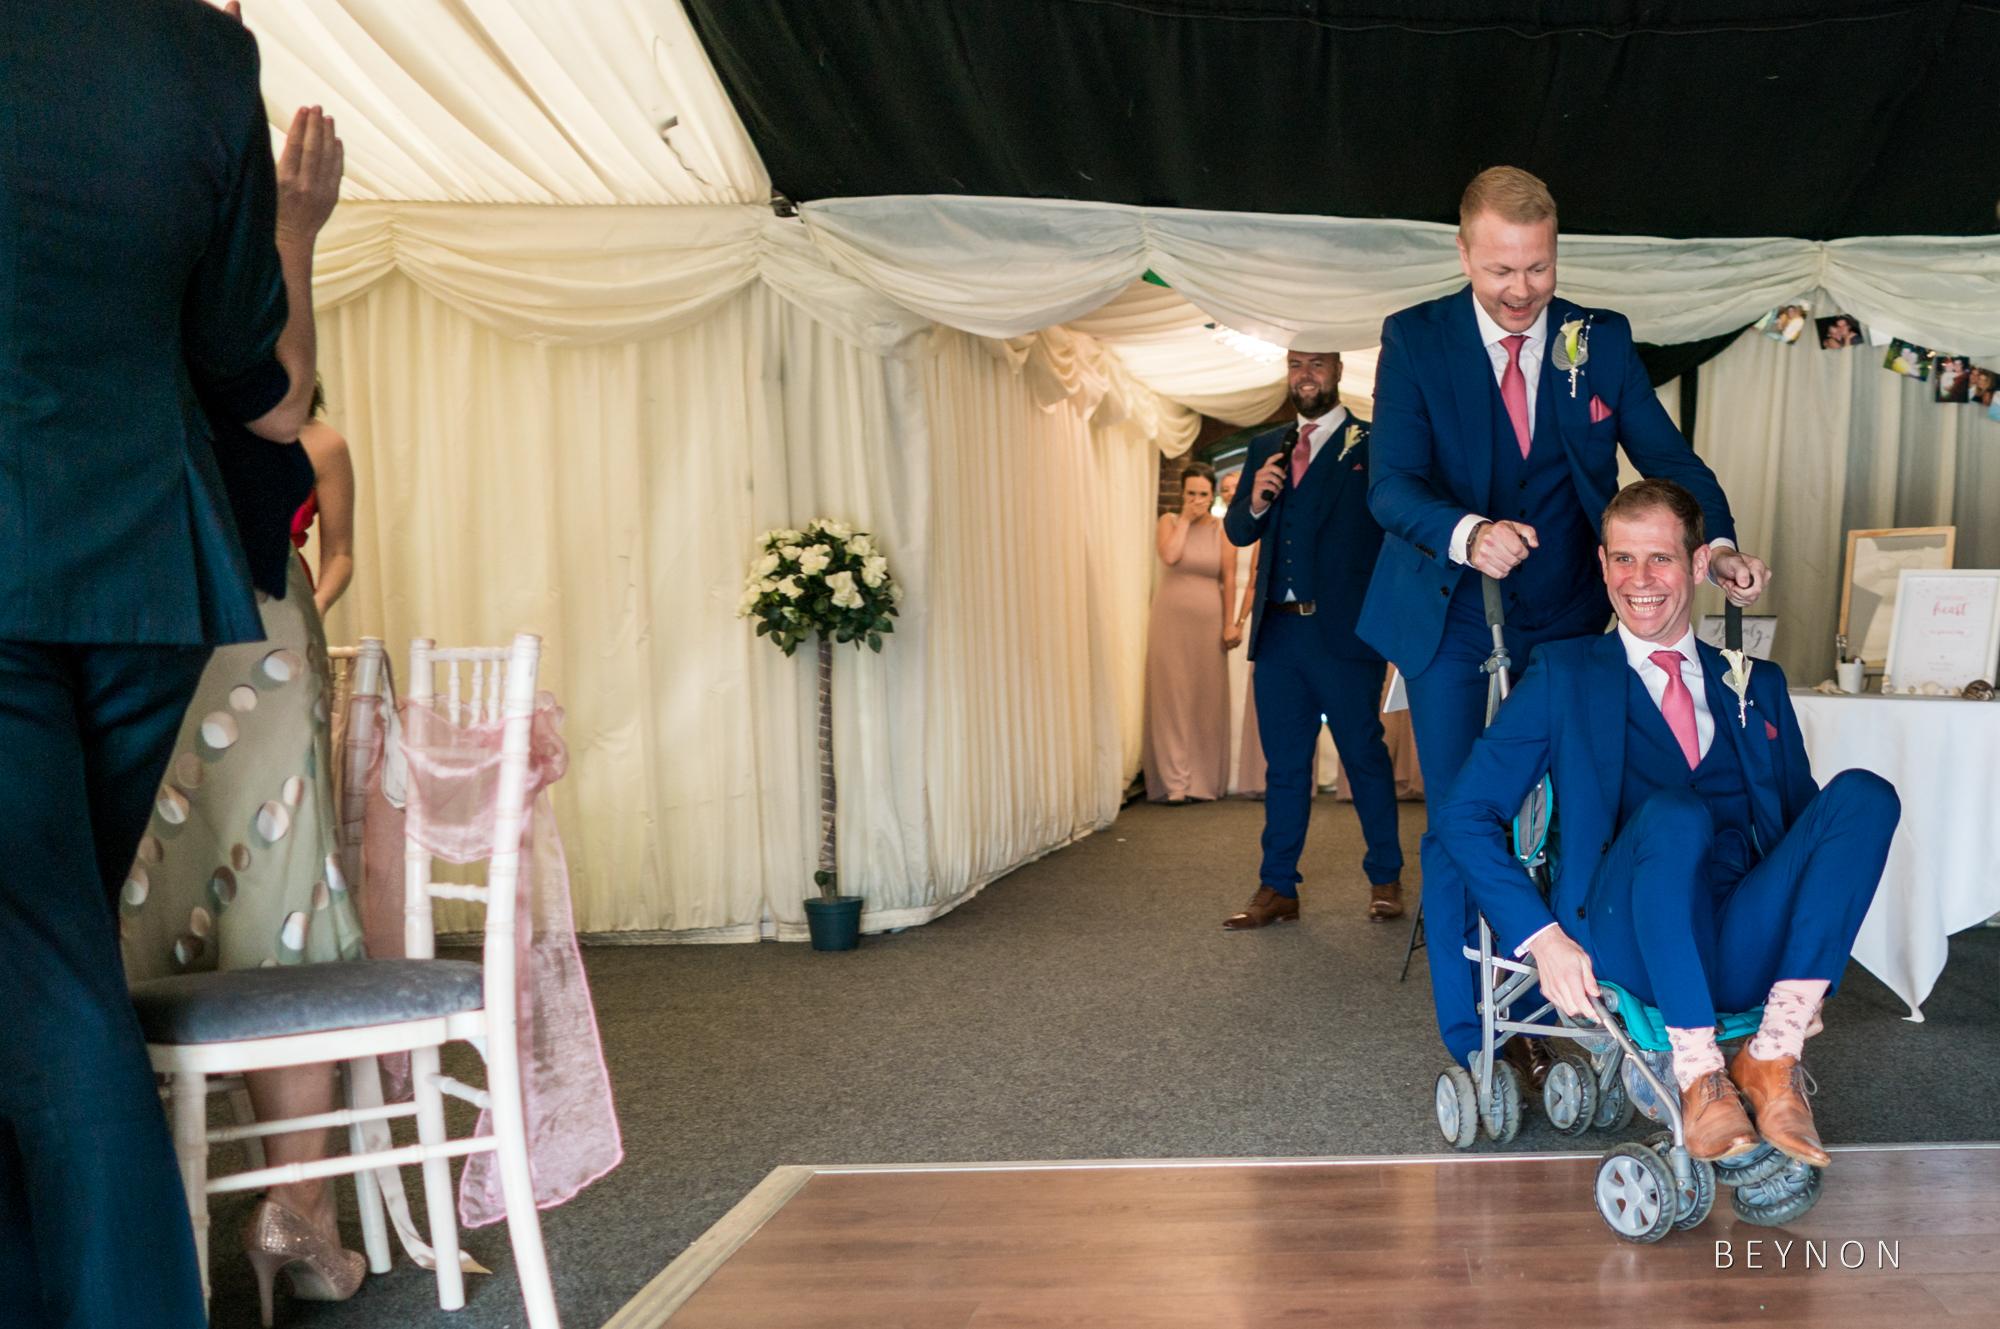 The groomsmen enter in a pushchair